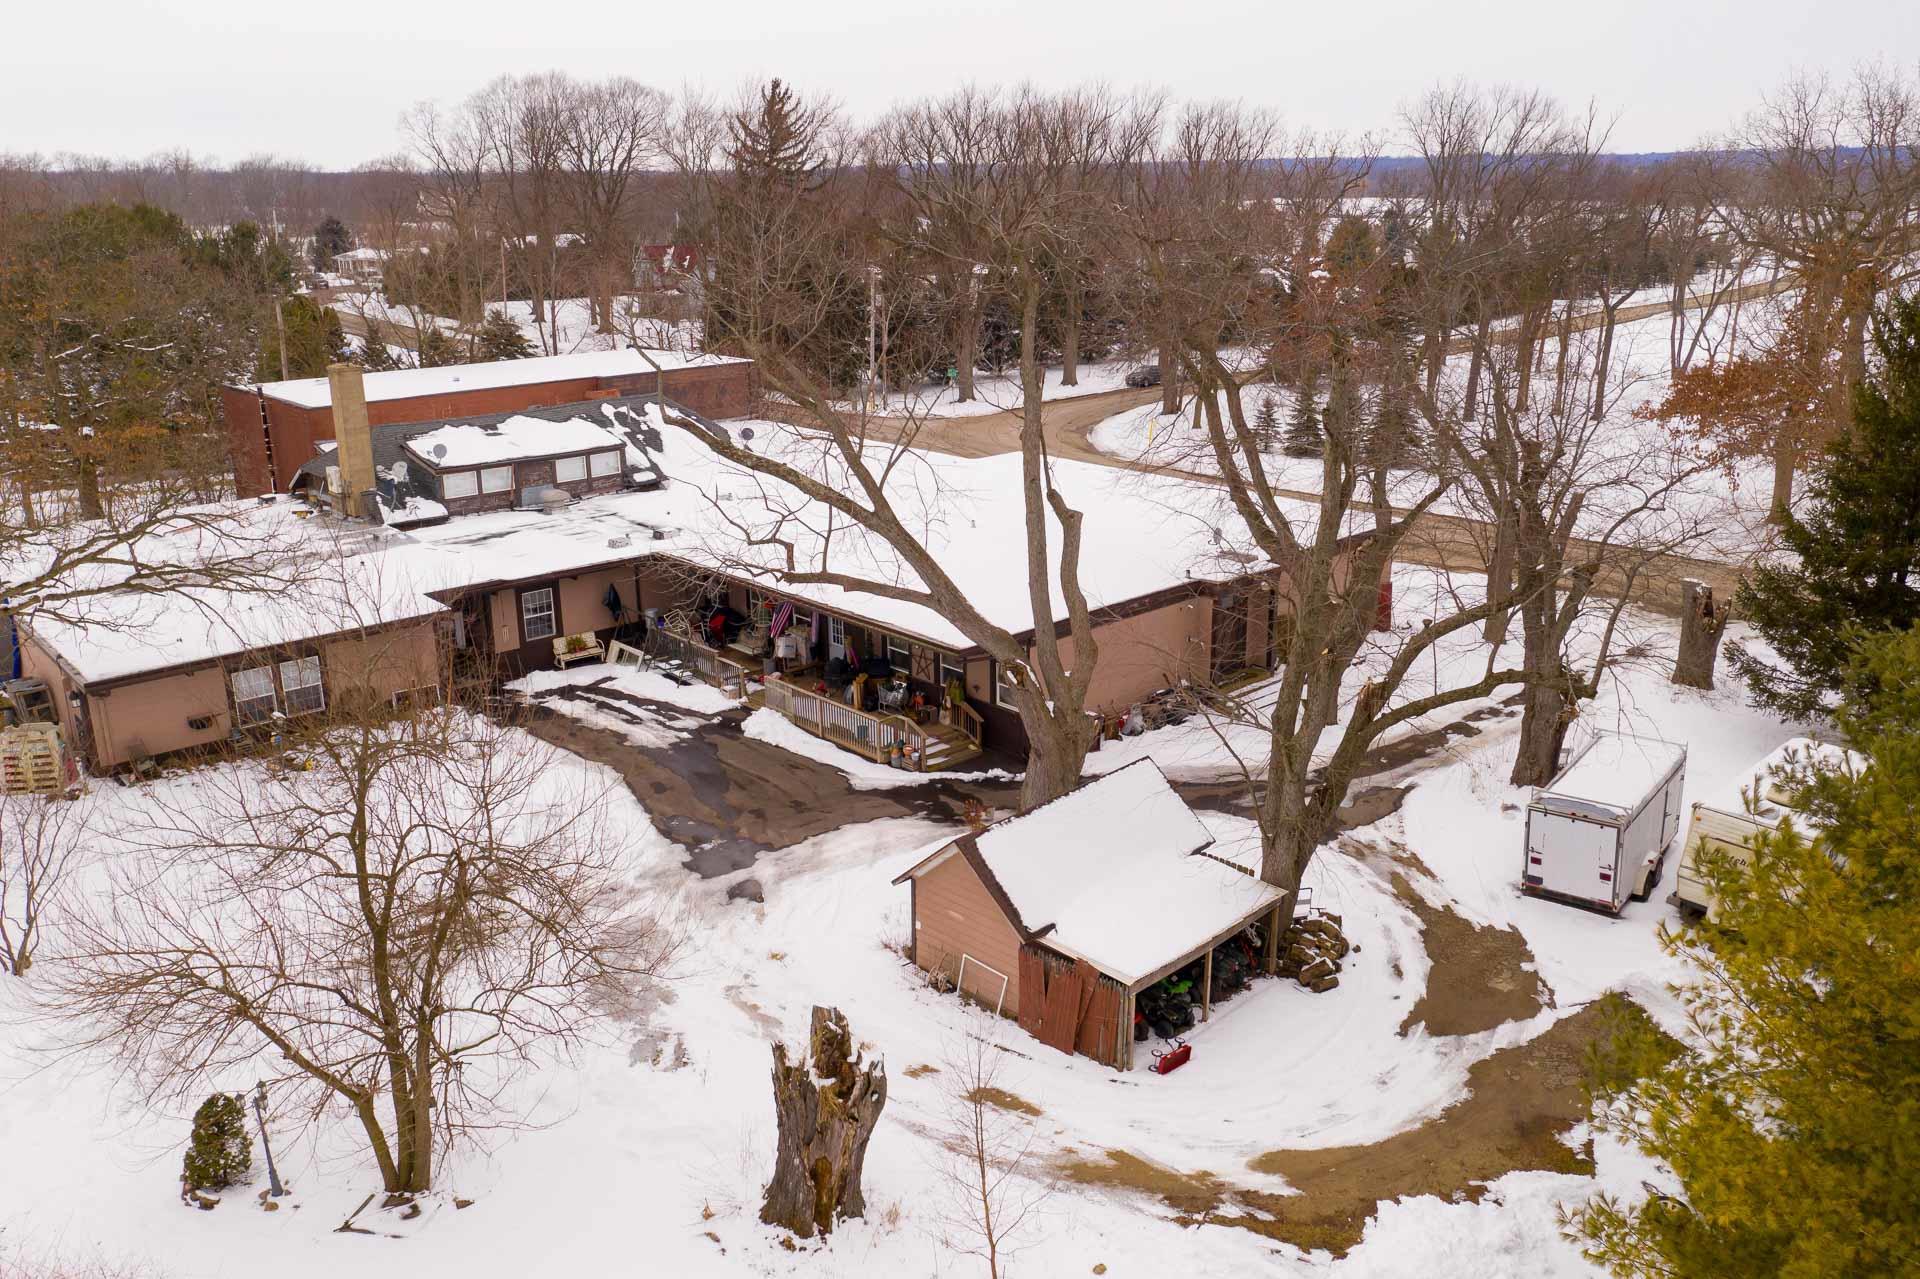 W6595 Walworth Rd, Walworth, Wisconsin 53184, 7 Bedrooms Bedrooms, 14 Rooms Rooms,4 BathroomsBathrooms,Single-Family,For Sale,Walworth Rd,1677012